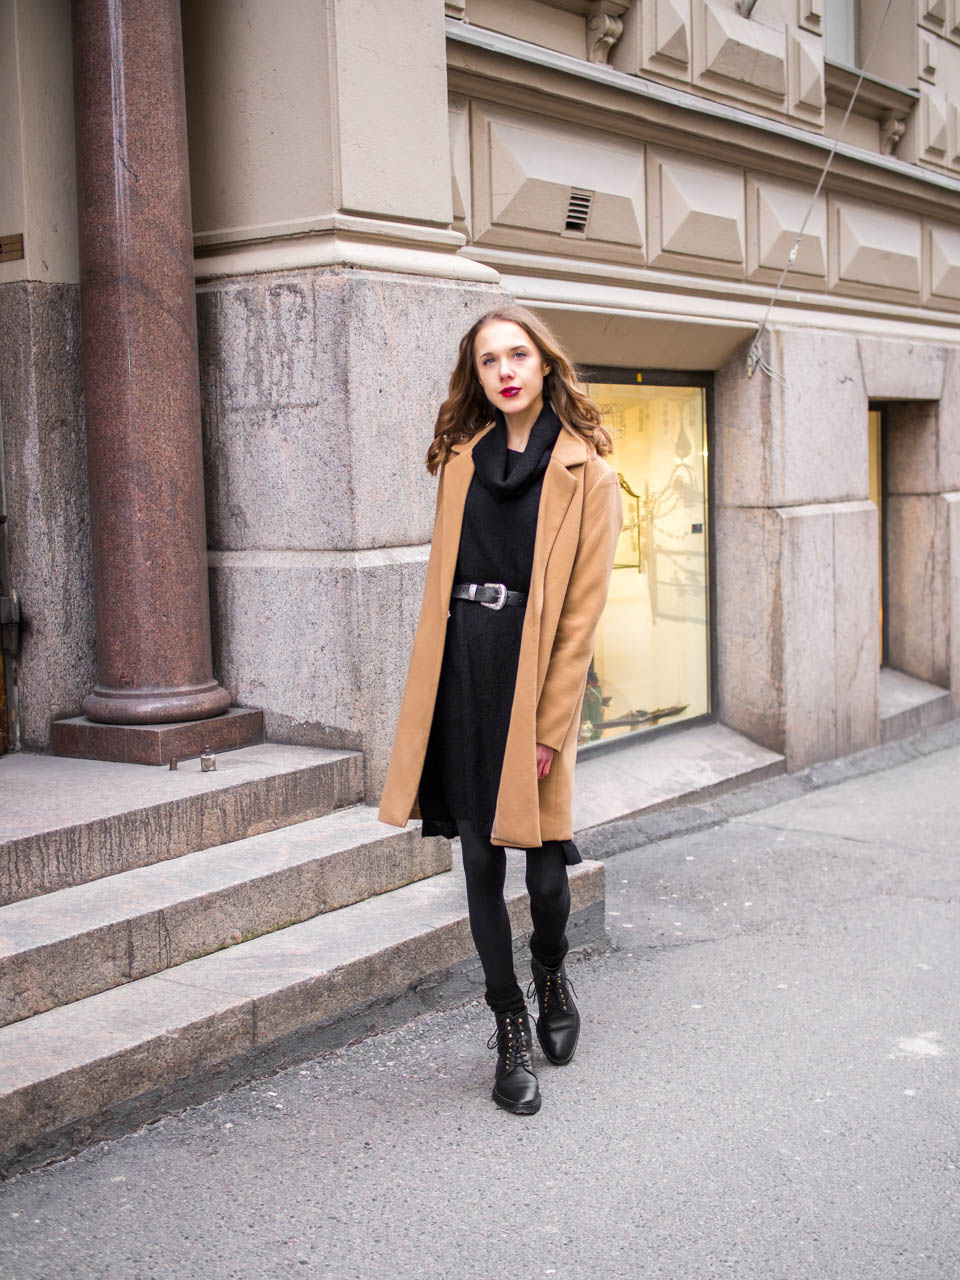 Scandinavian streetstyle, black jumper dress and camel coat - Muotibloggaaja, helsinki, musta neulemekko, kamelitakki